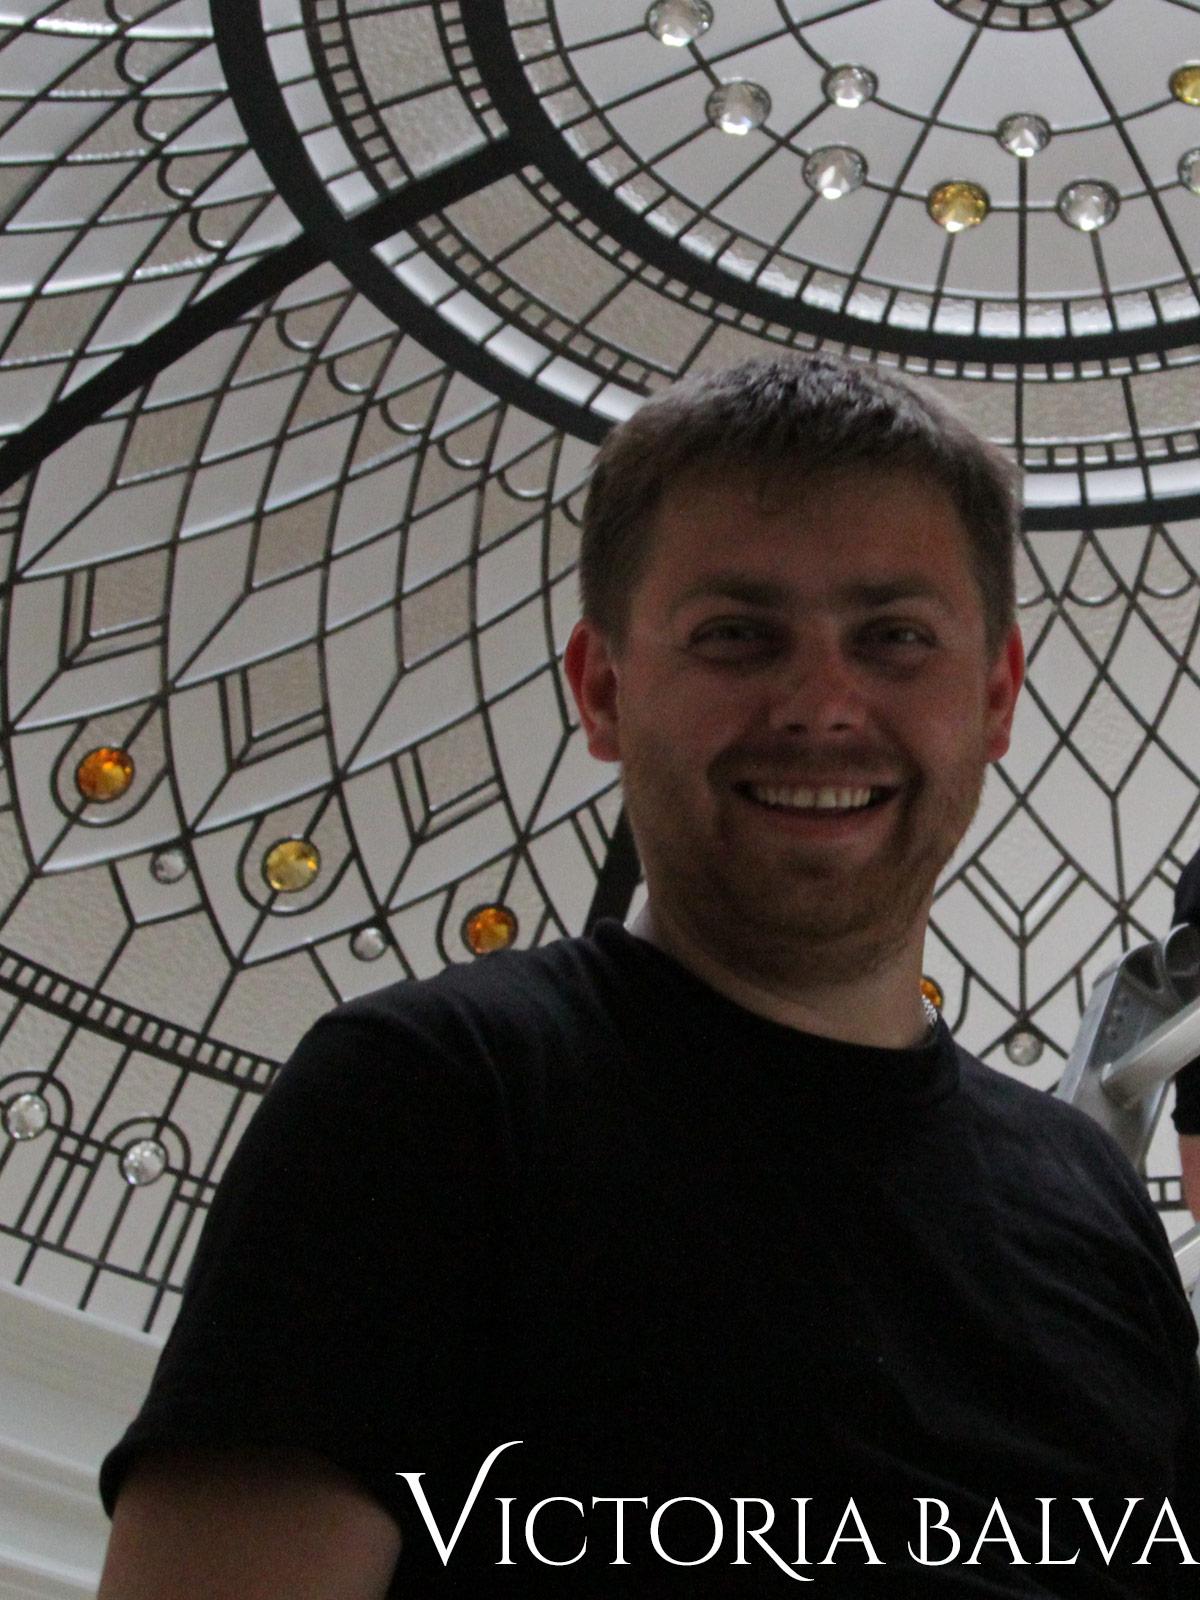 Yurii Serhieiev, team member of Victoria Balva Glass Studio